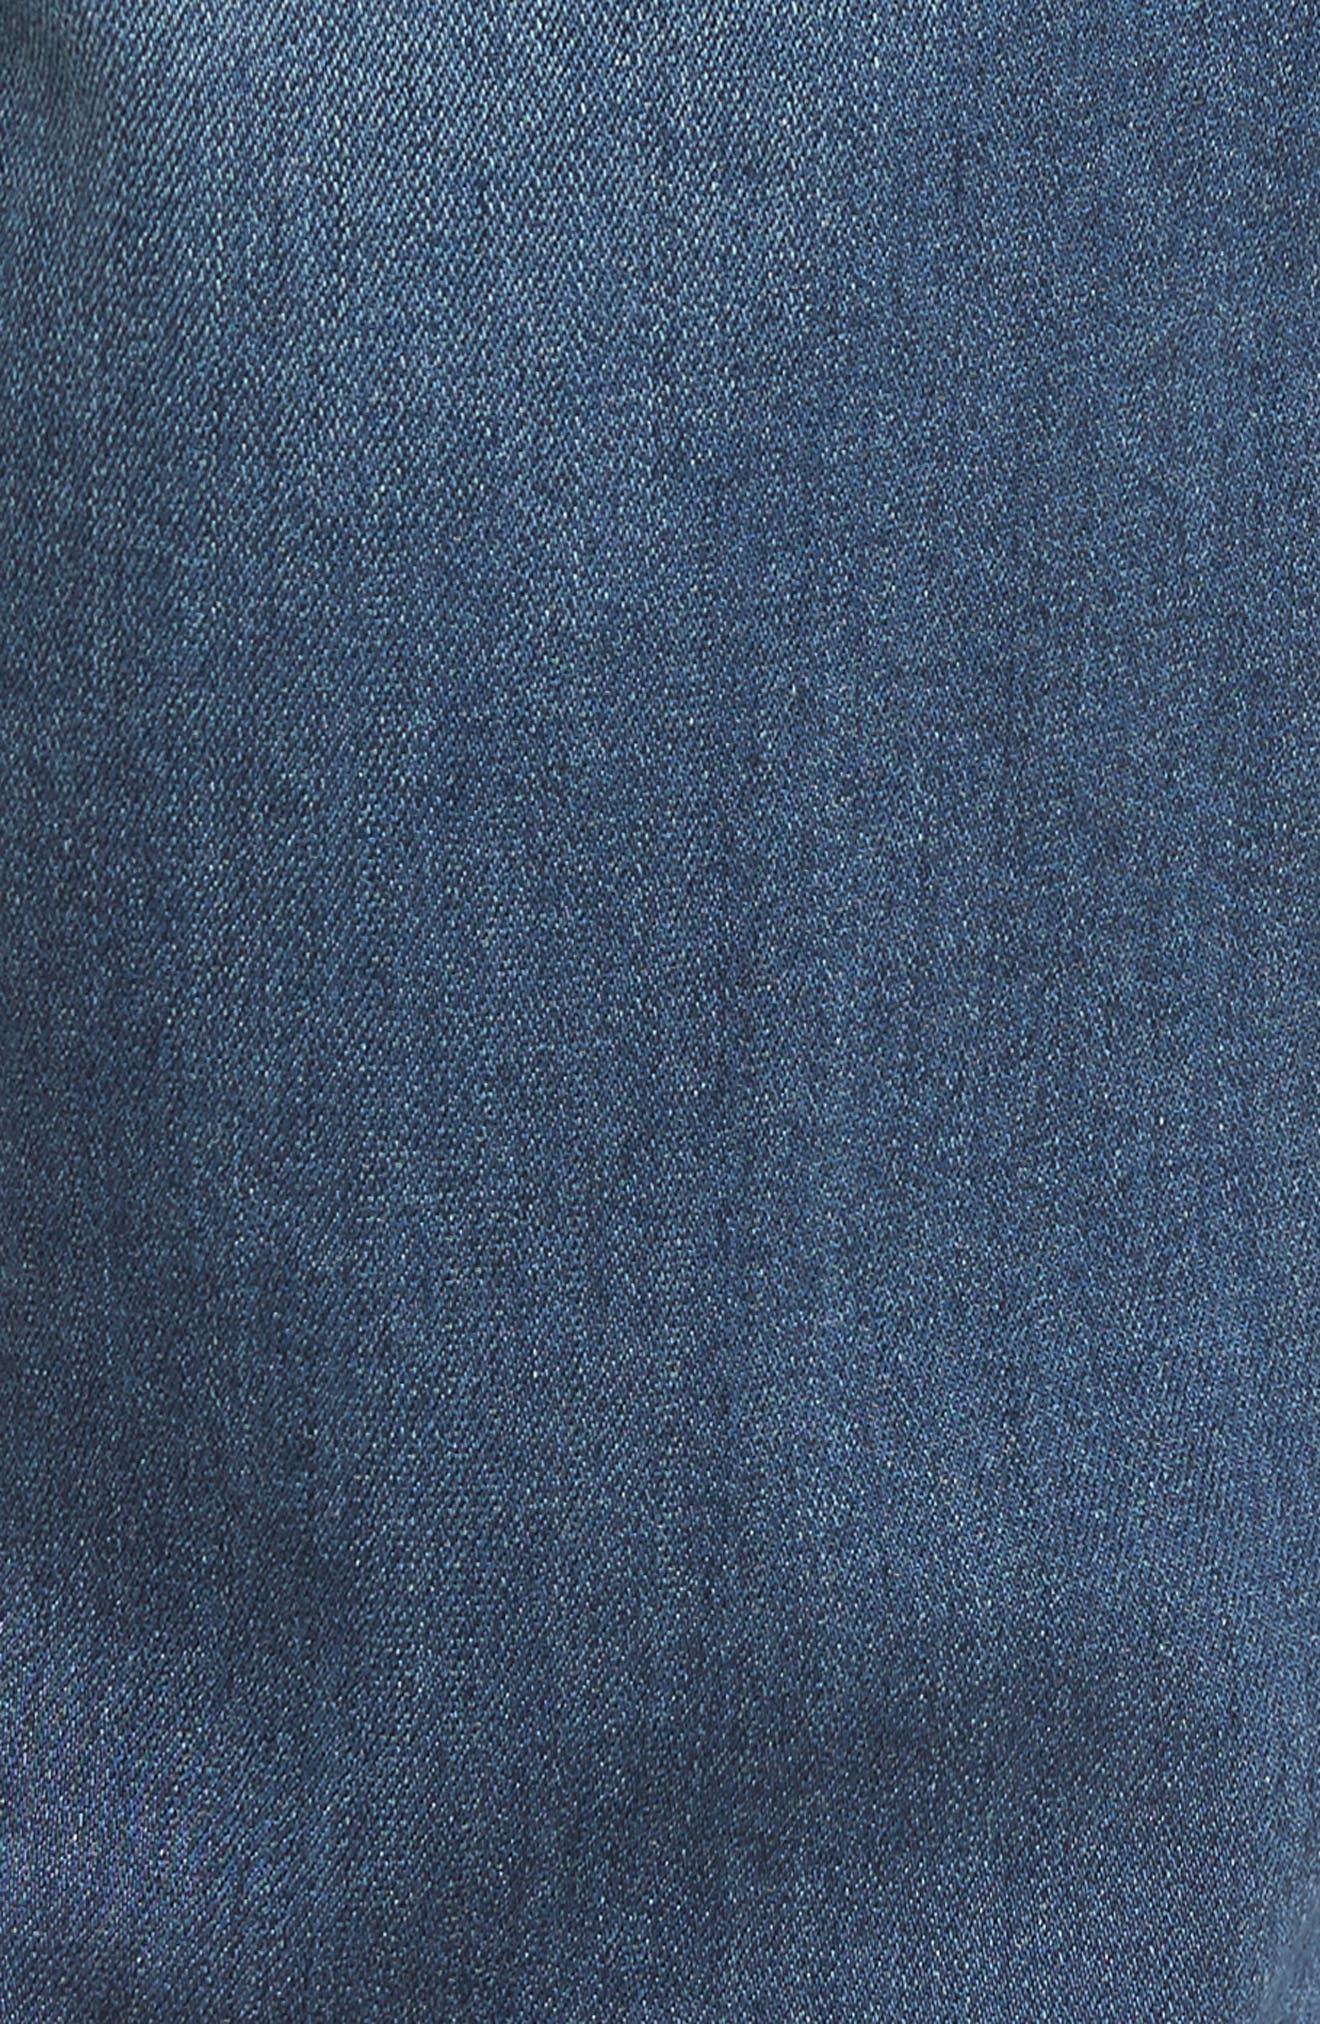 Transcend - Federal Slim Straight Fit Jeans,                             Alternate thumbnail 5, color,                             Skyler